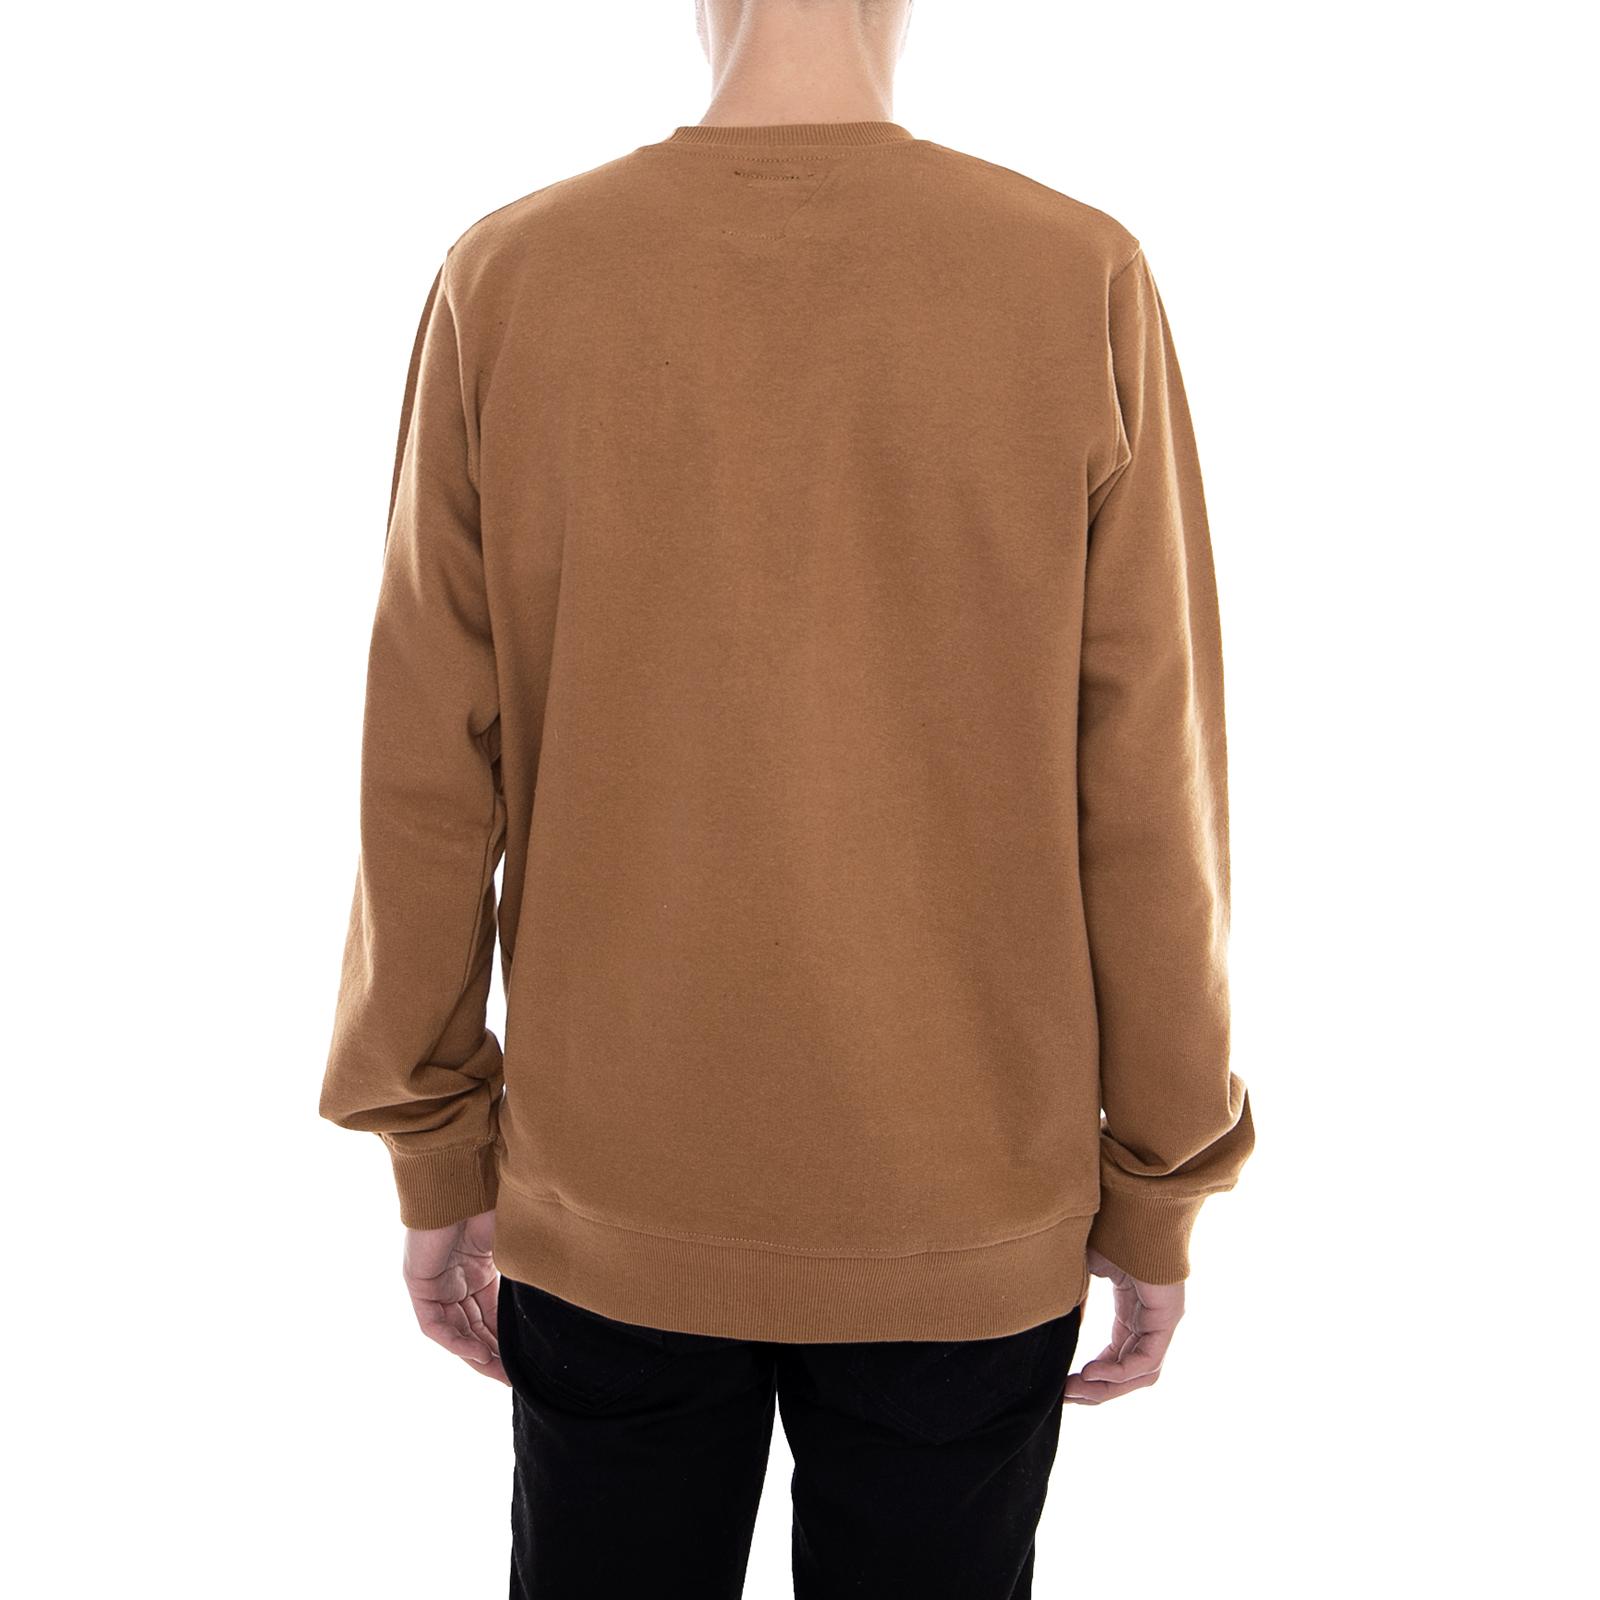 Sweatshirts Dickies Sweatshirts Harrison Brown Duck Dickies Harrison Brown Dickies Sweatshirts Harrison Duck Duck xUqwRdU